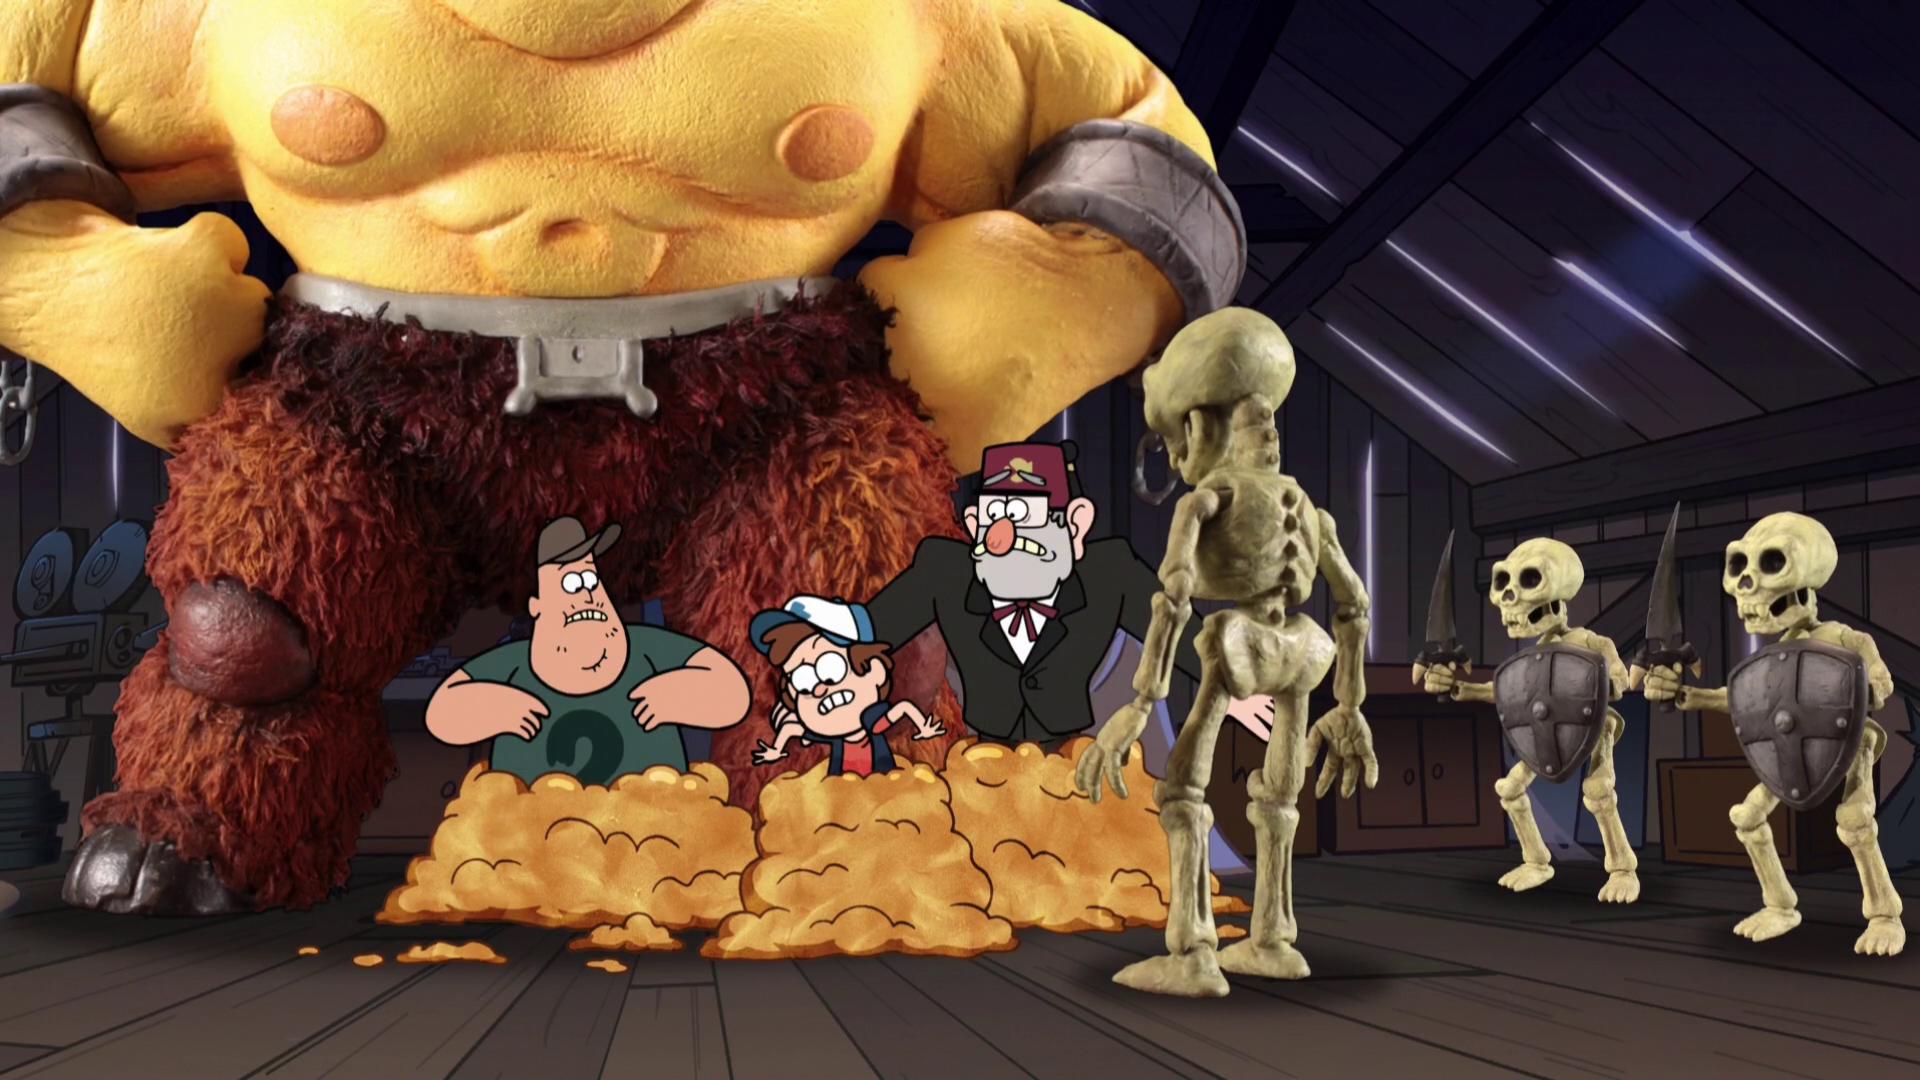 Clay Monsters Gravity Falls Wiki Fandom Powered By Wikia